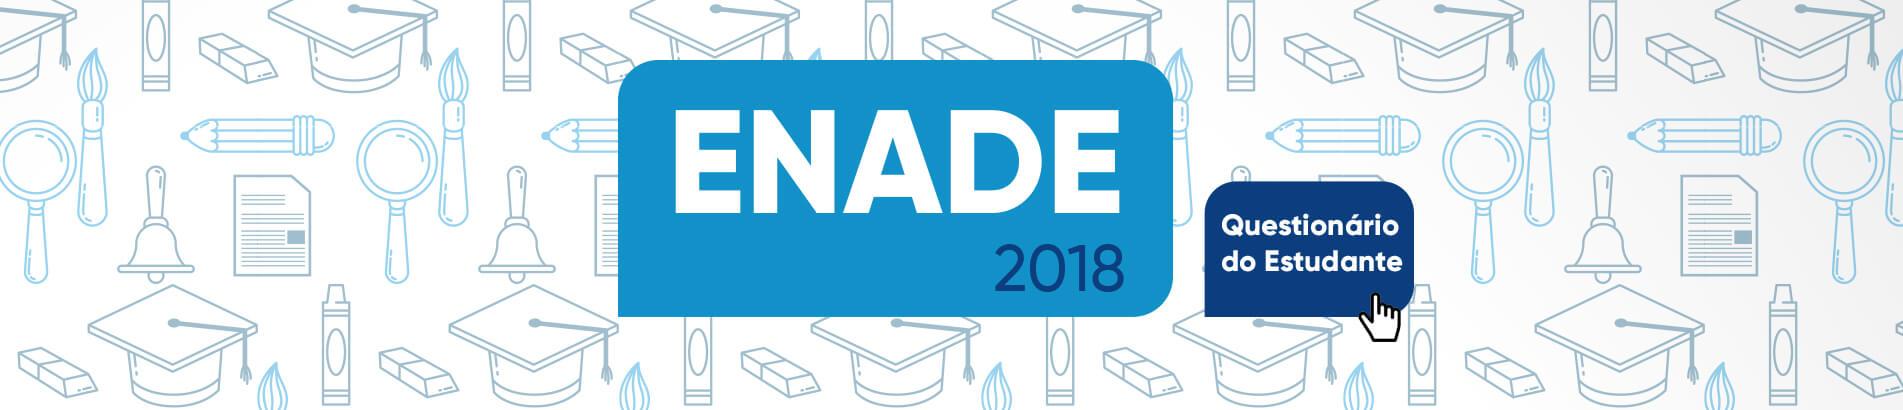 Banner rotativo desktop - Enade 2018